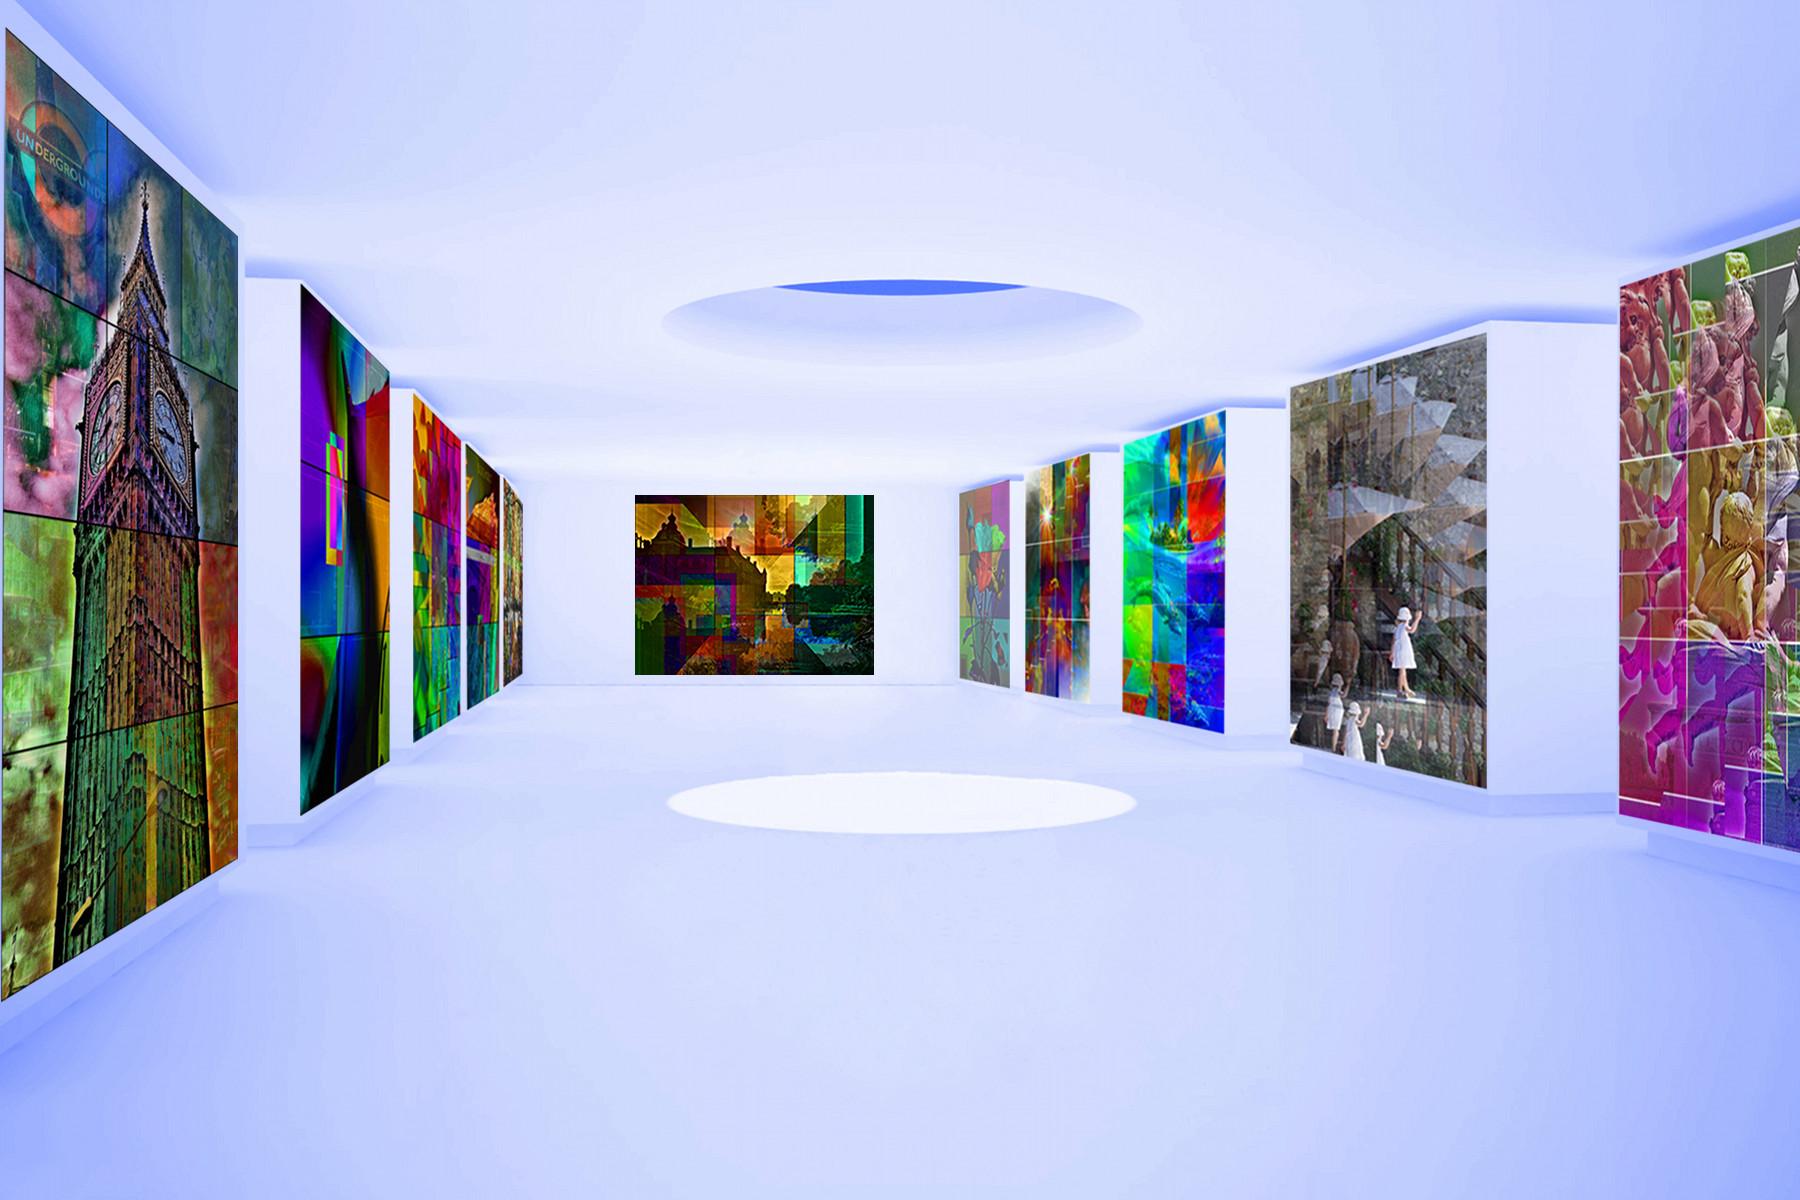 galeria-afinacao-da-alma